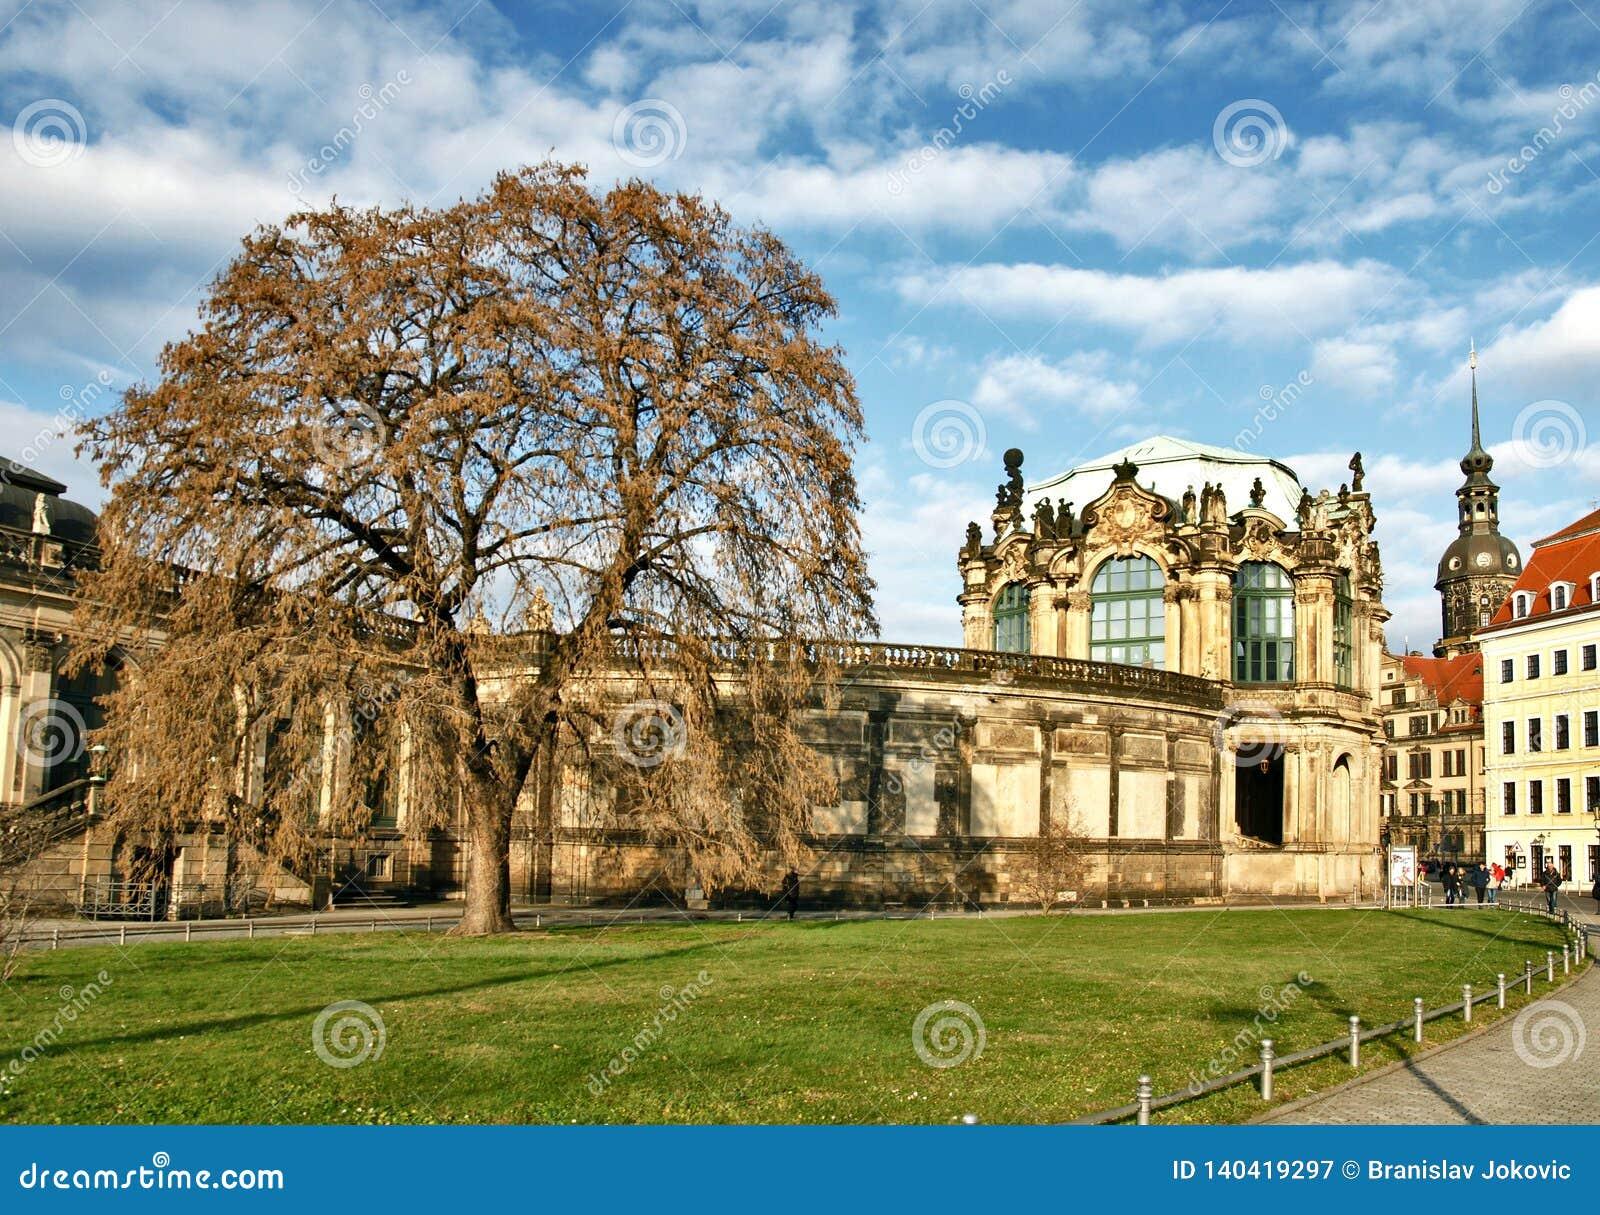 Здание Дрездена старое